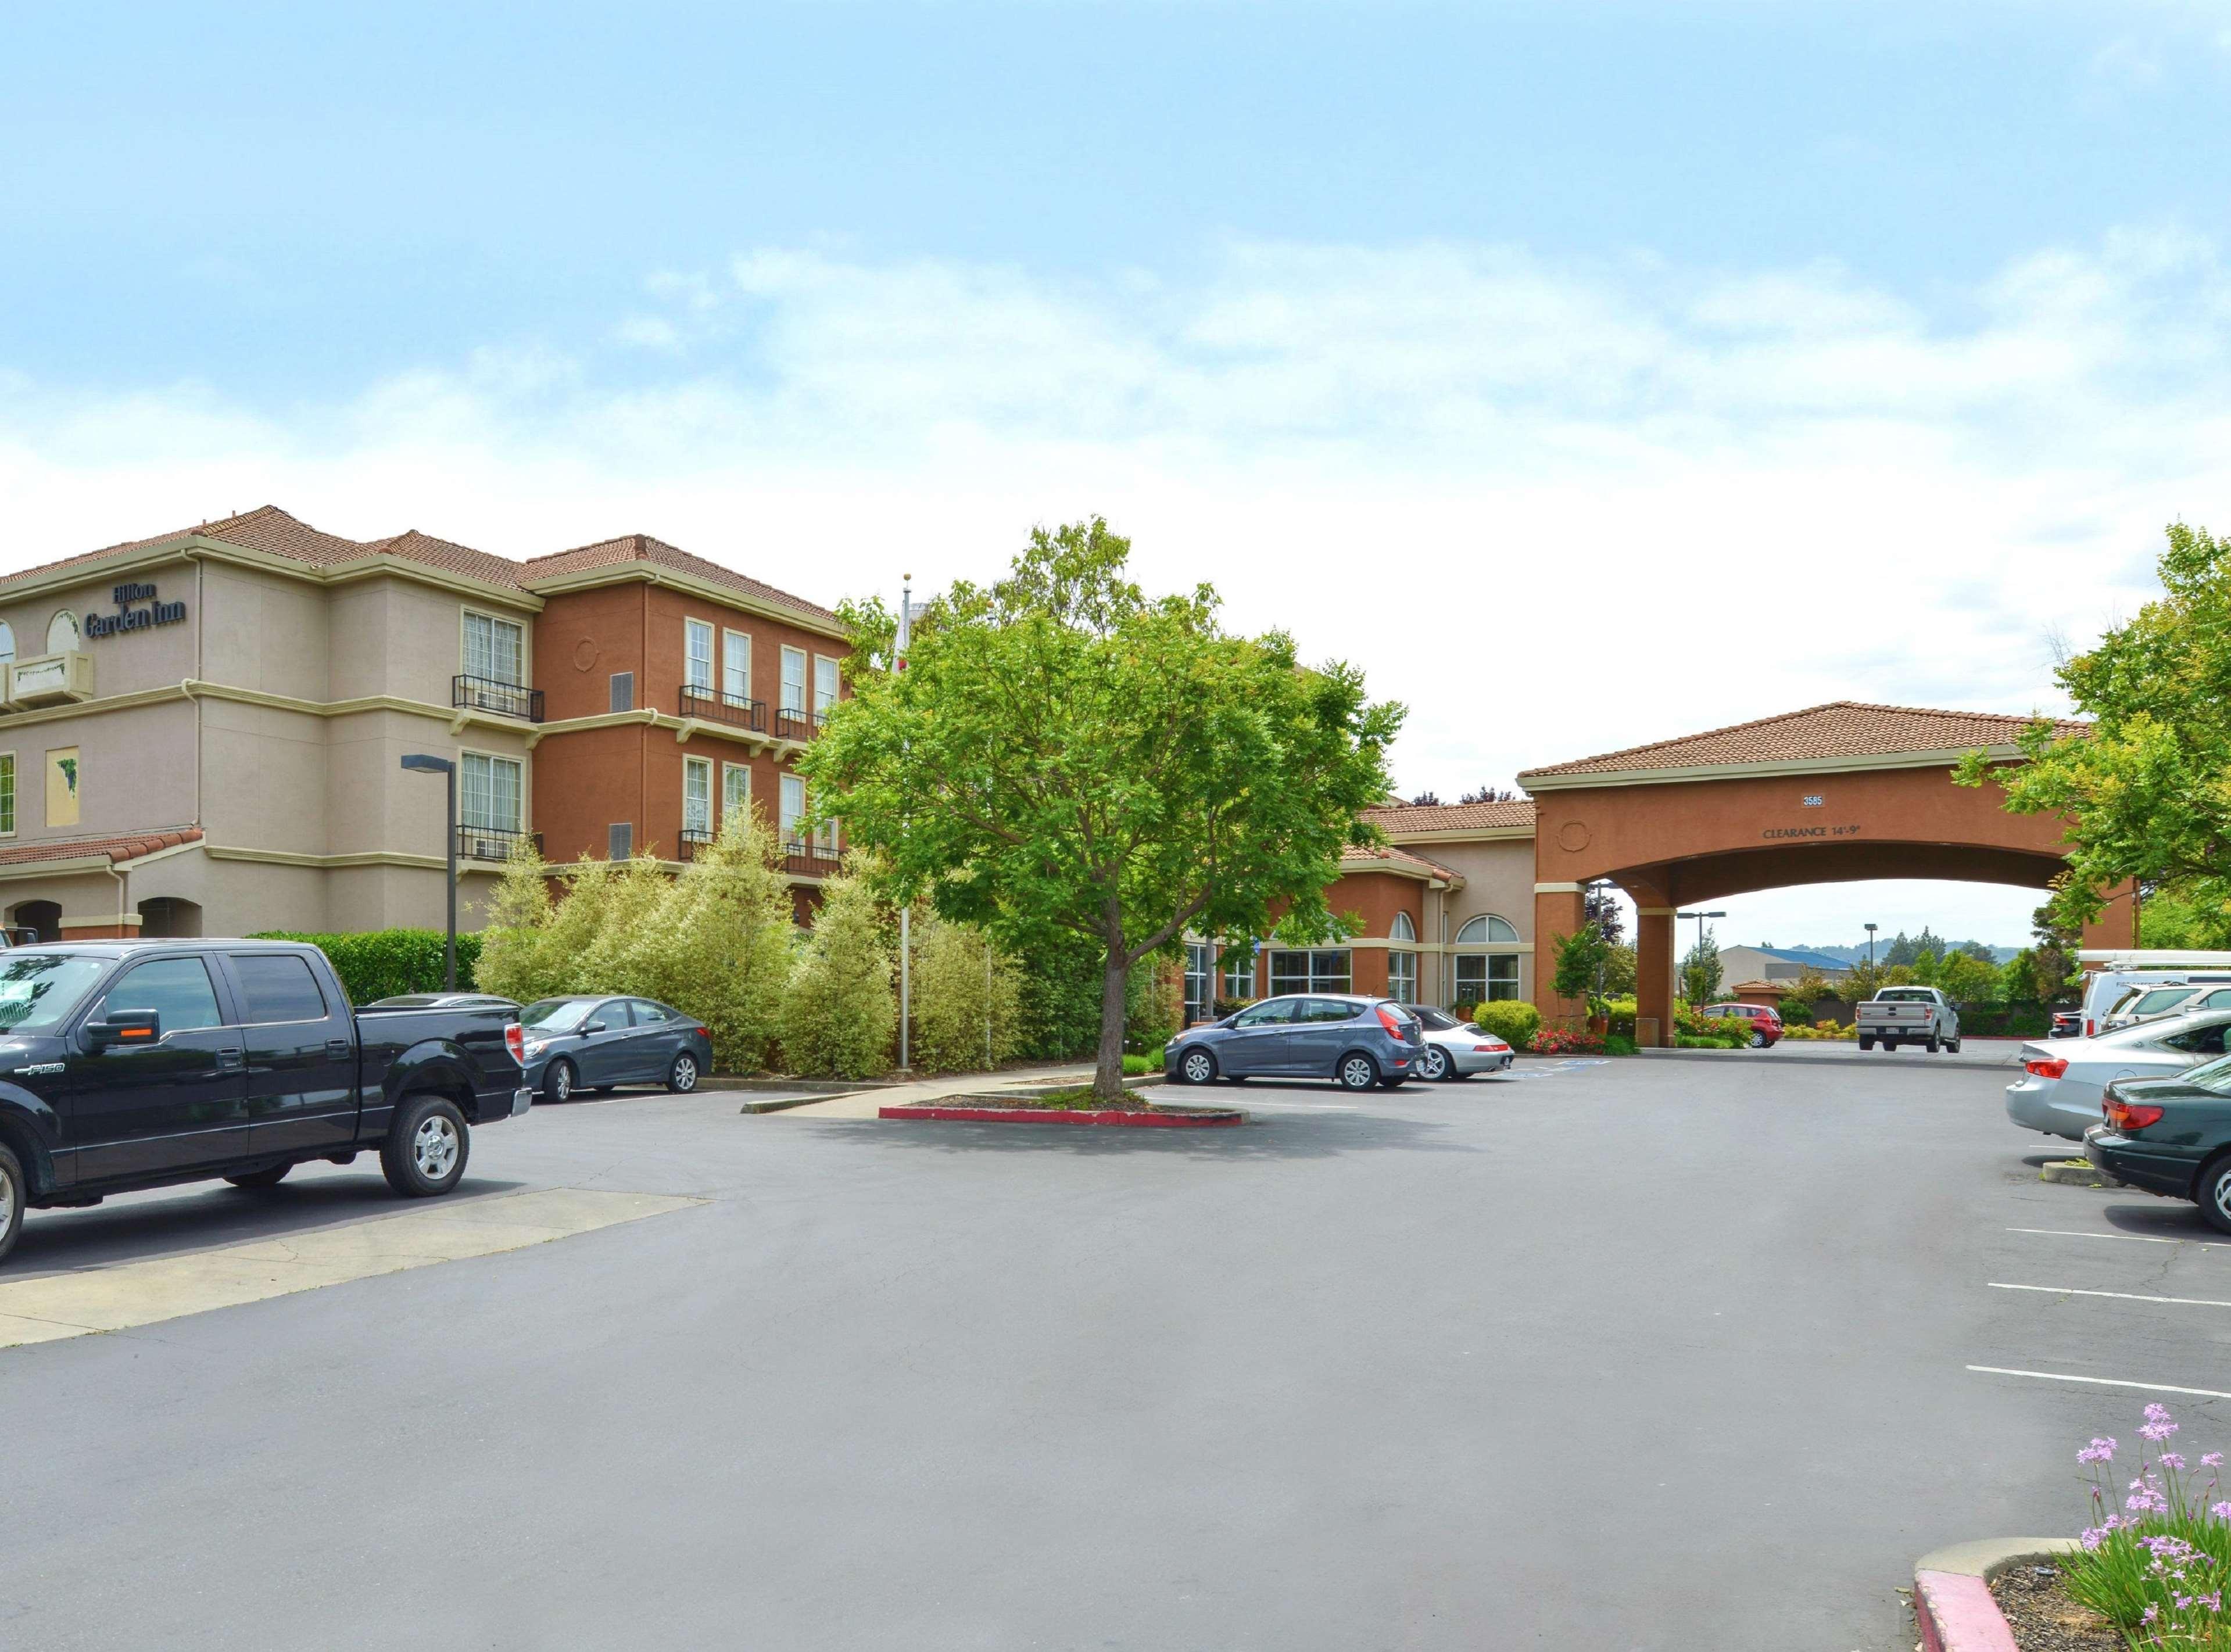 Hilton Garden Inn Napa In Napa Ca 94558